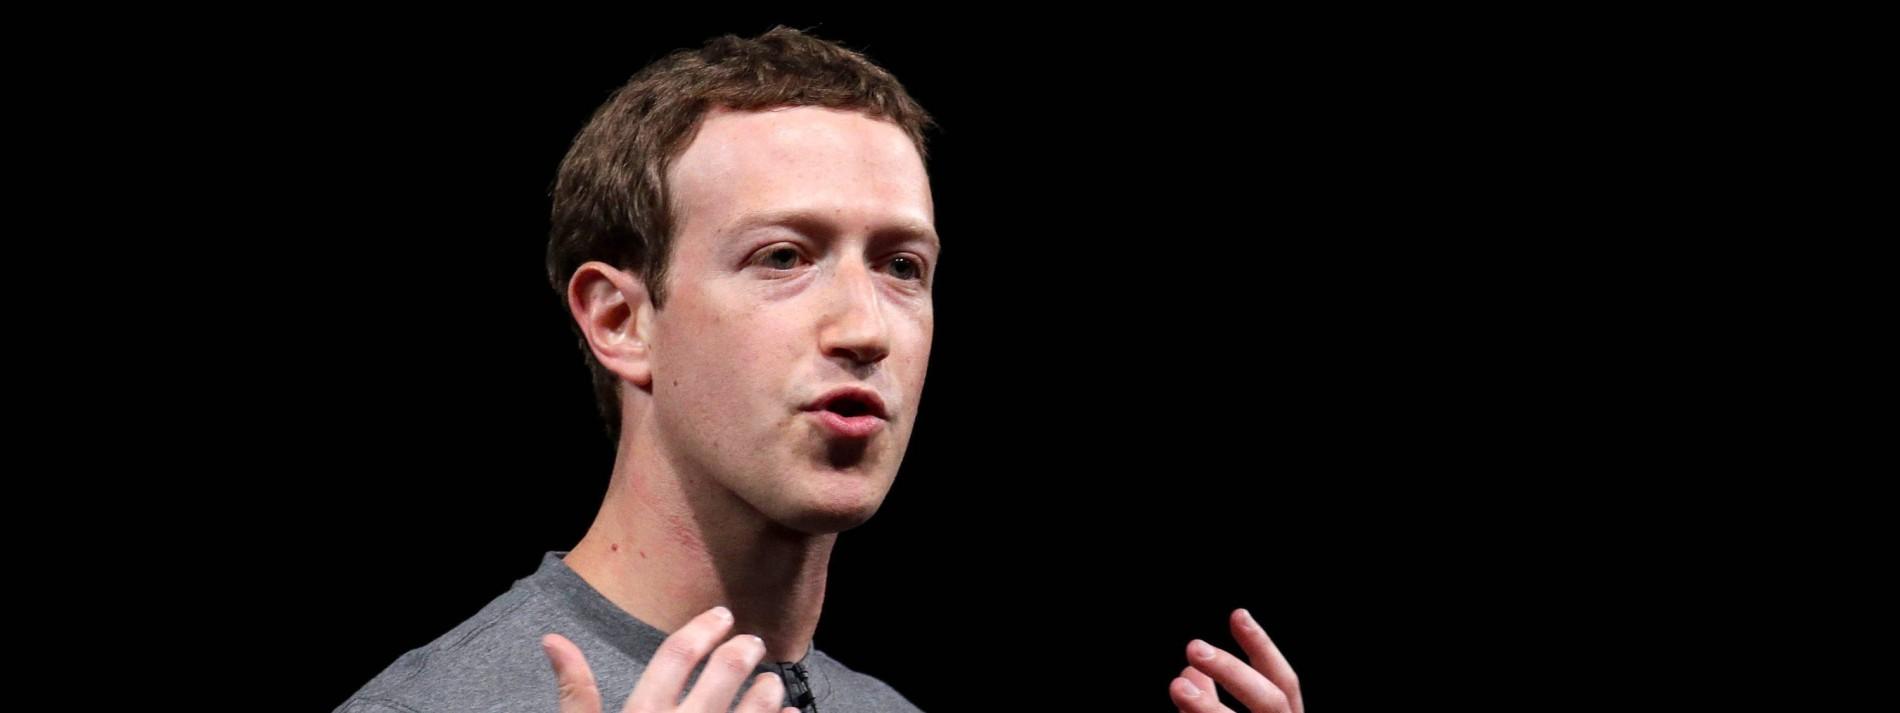 Mode made by Zuckerberg